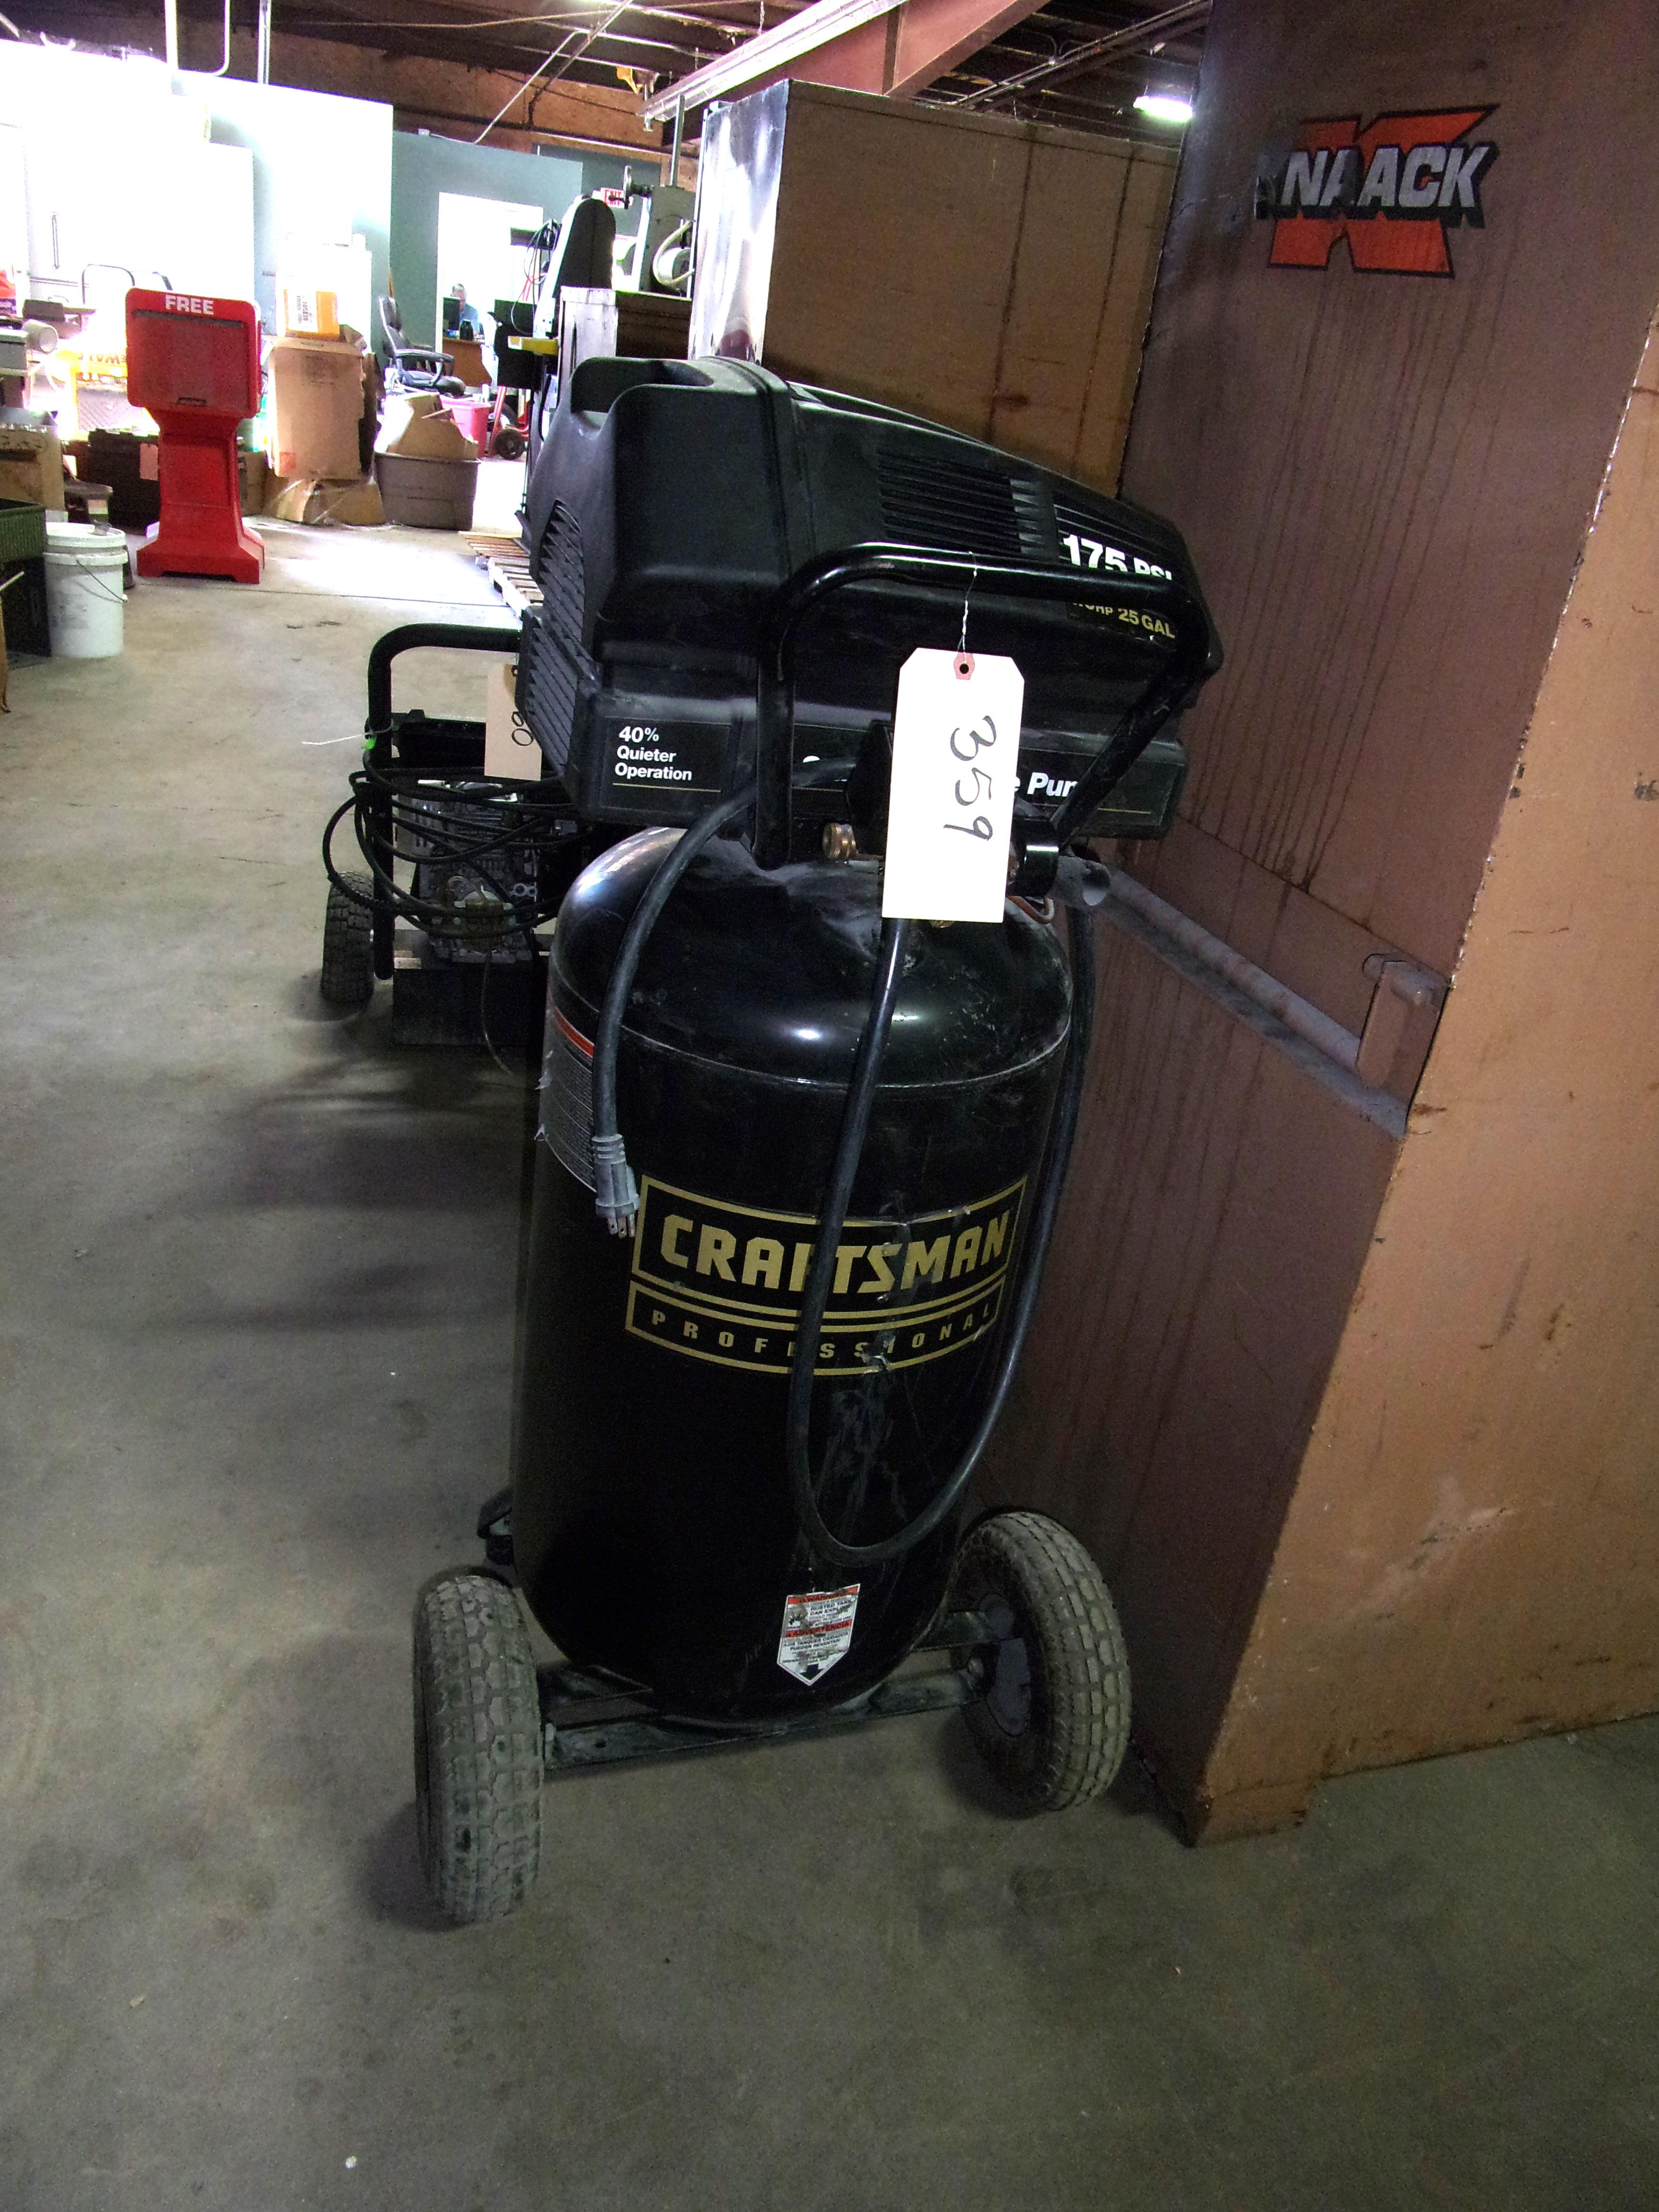 Craftsman 1 6hp 25 Gallon Portable Air Compressor 175 Psi